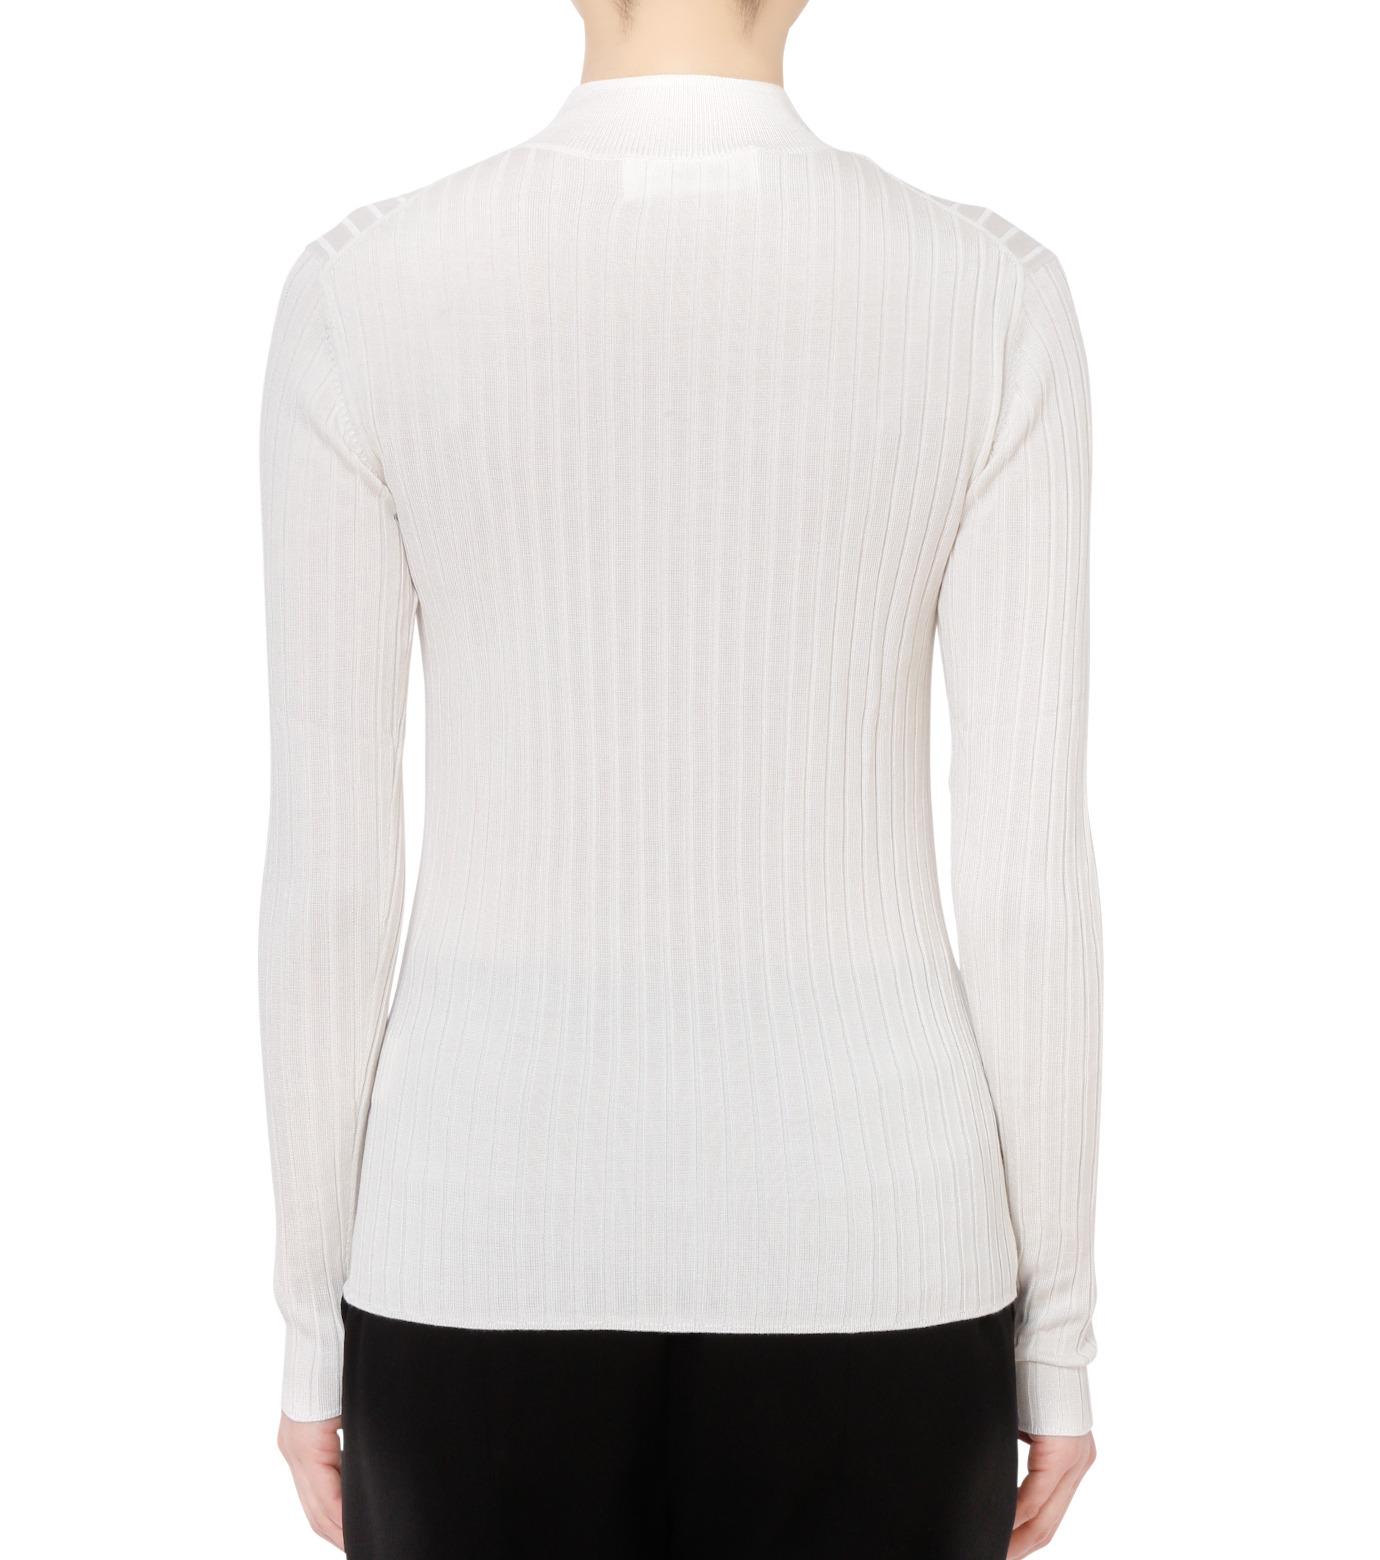 LE CIEL BLEU(ルシェルブルー)のシルクワイドリブトップス-WHITE(ニット/knit)-18S61013 拡大詳細画像3